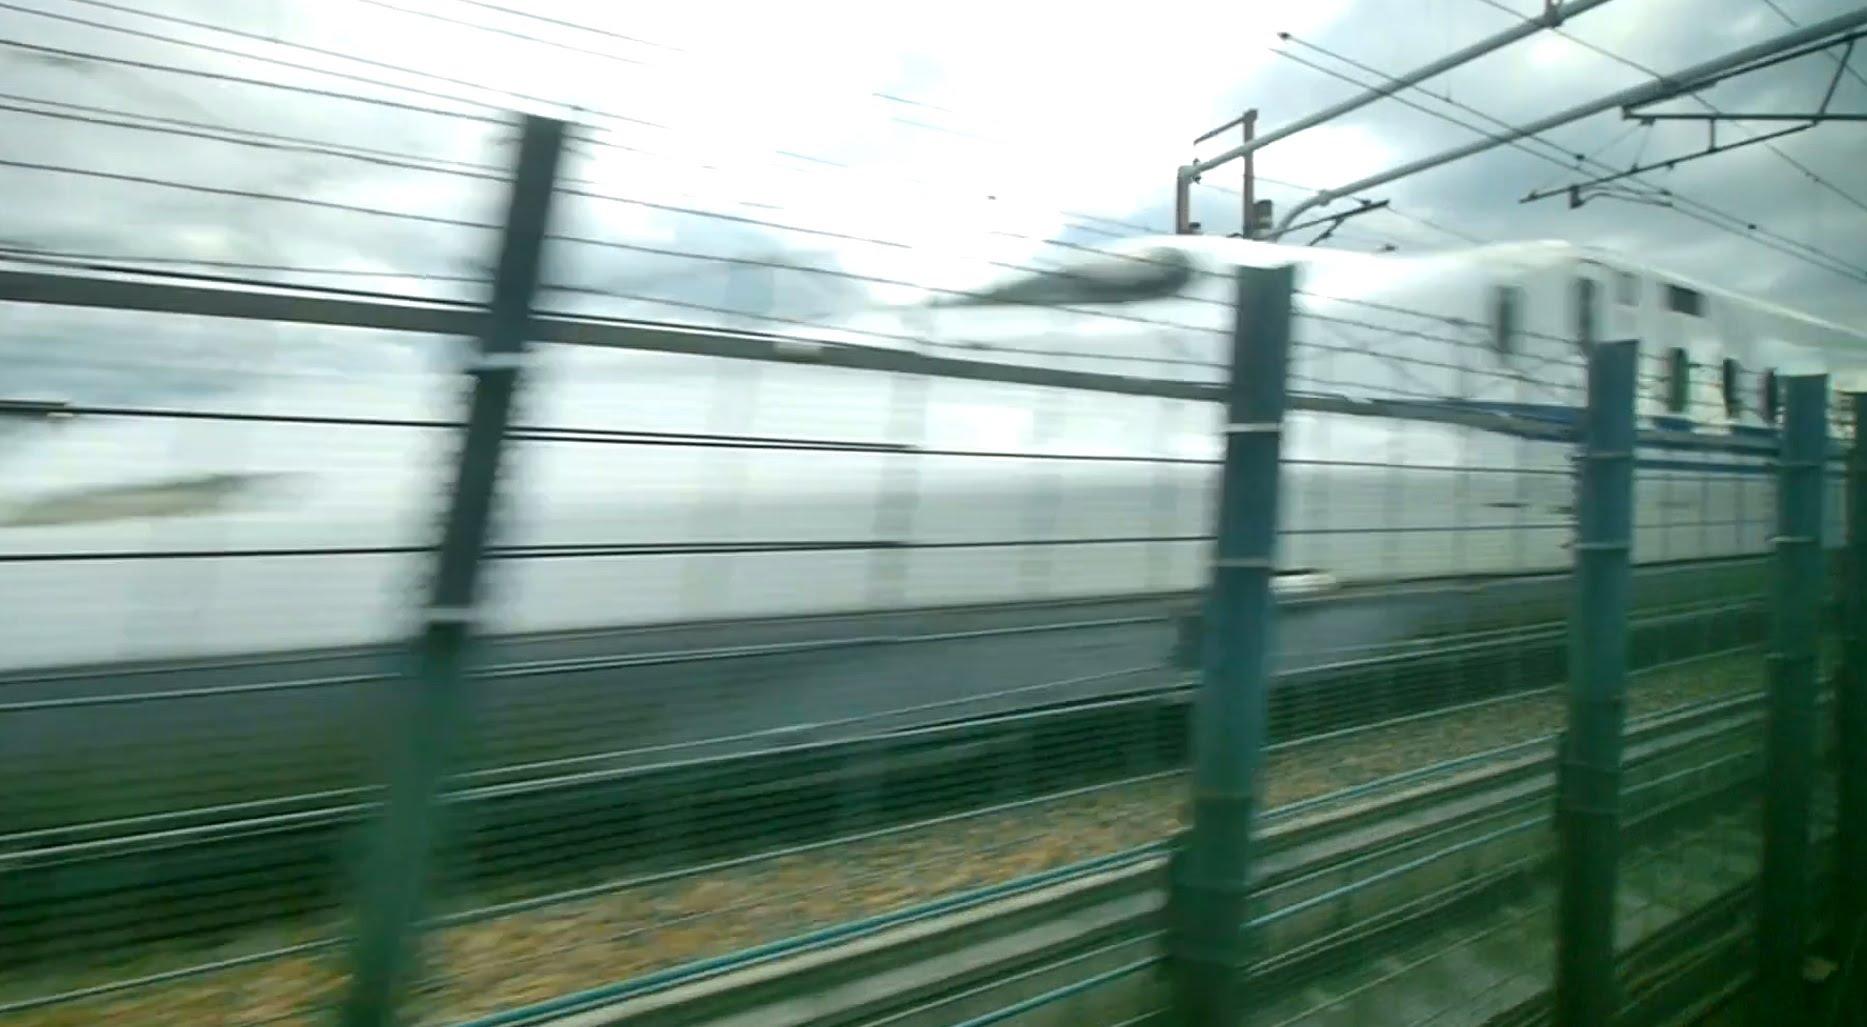 【60fps】阪急電鉄 京都線特急 超広角車窓 進行左側 河原町~高槻市~十三・梅田